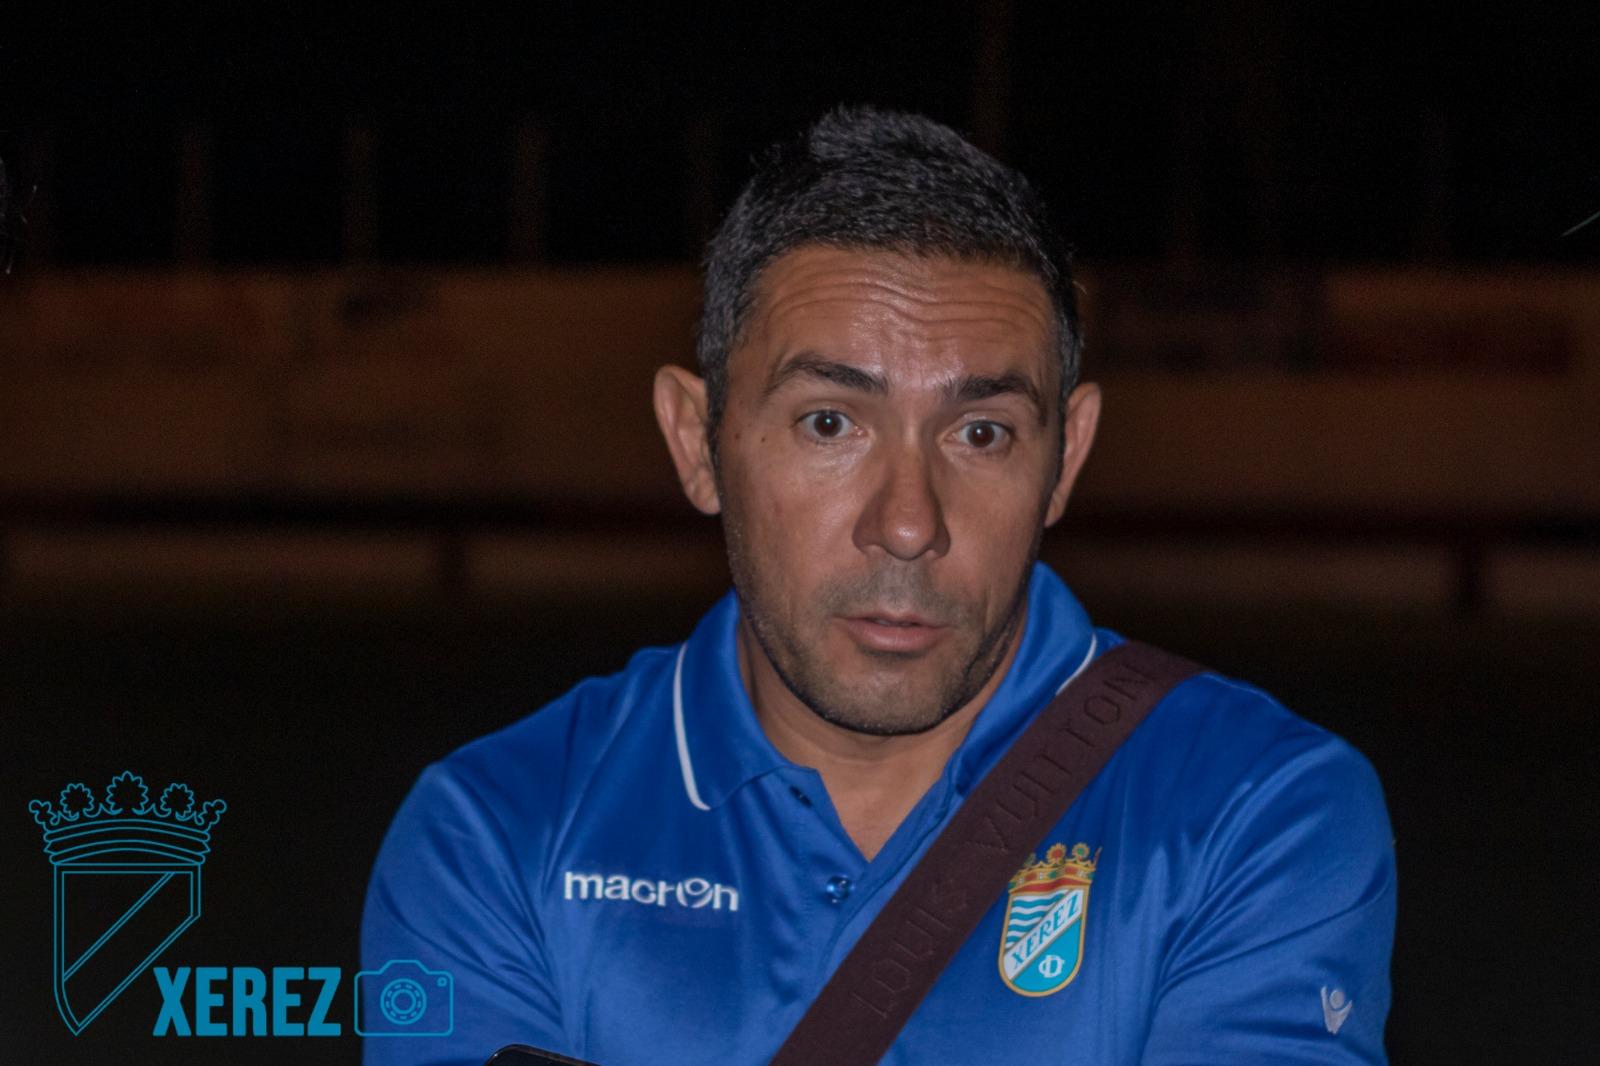 http://www.xerezclubdeportivo.es/wp-content/uploads/2019/08/WhatsApp-Image-2019-08-16-at-12.01.14.jpeg